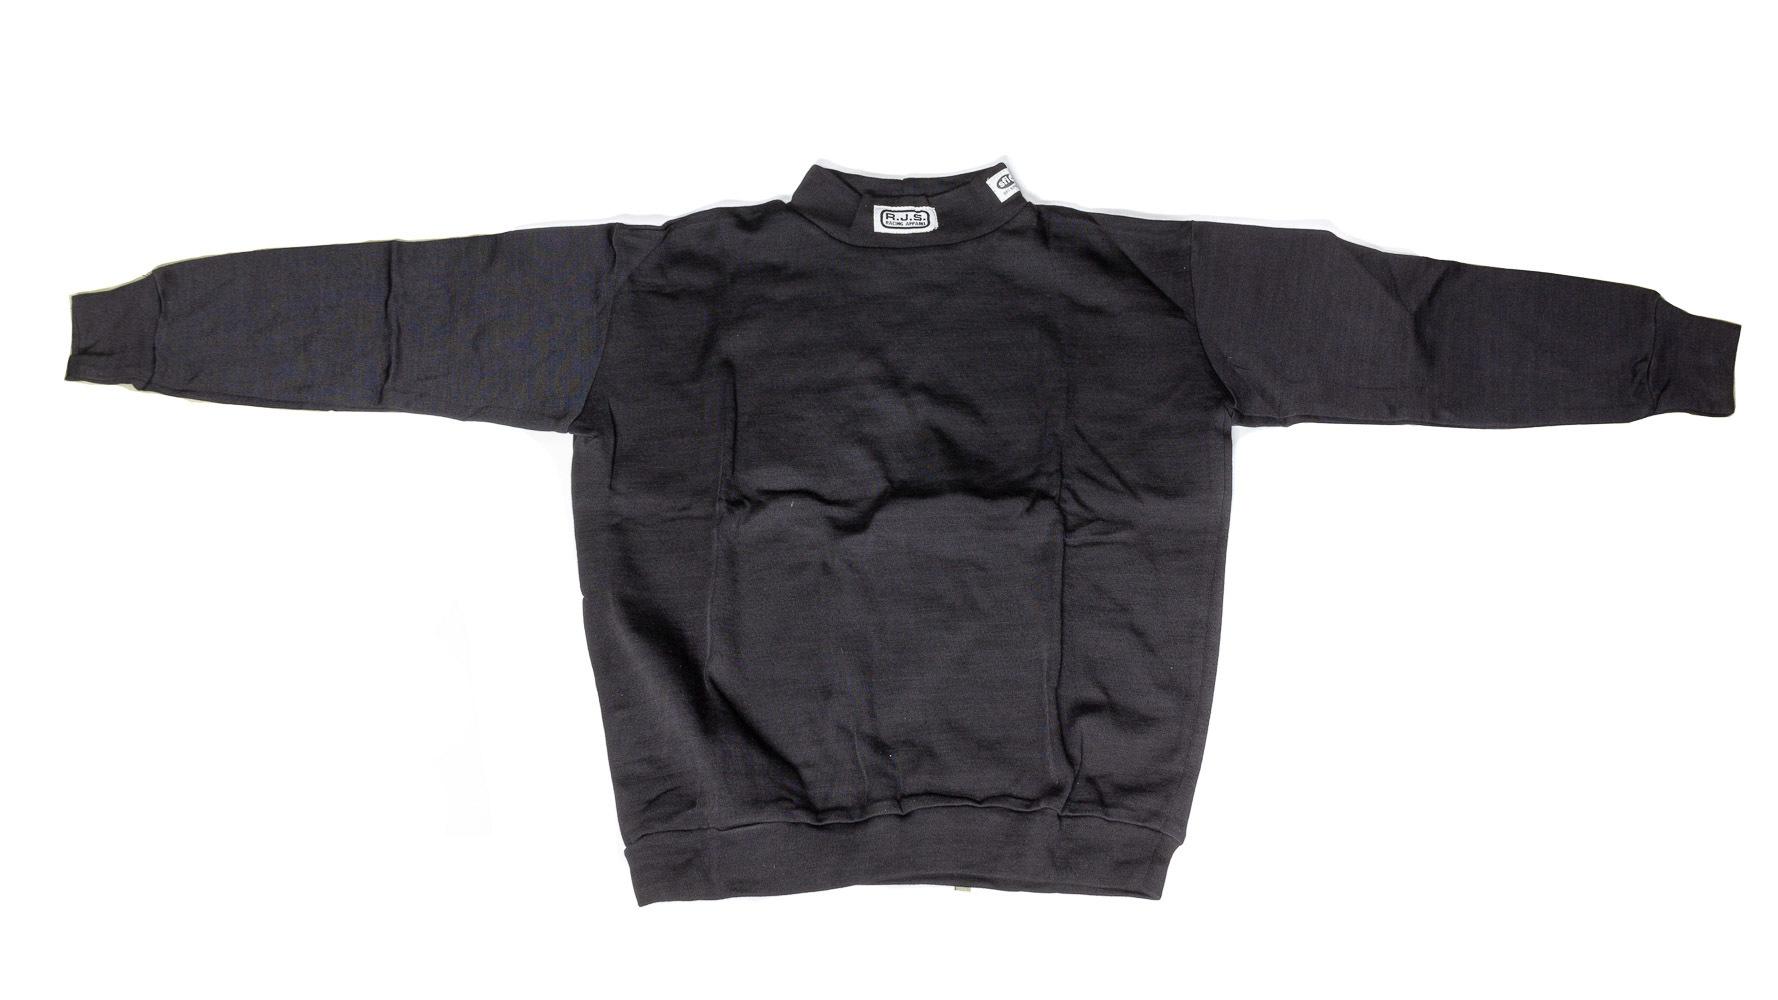 Rjs Safety FR Underwear Top Blk XX-Large SFI 3.3